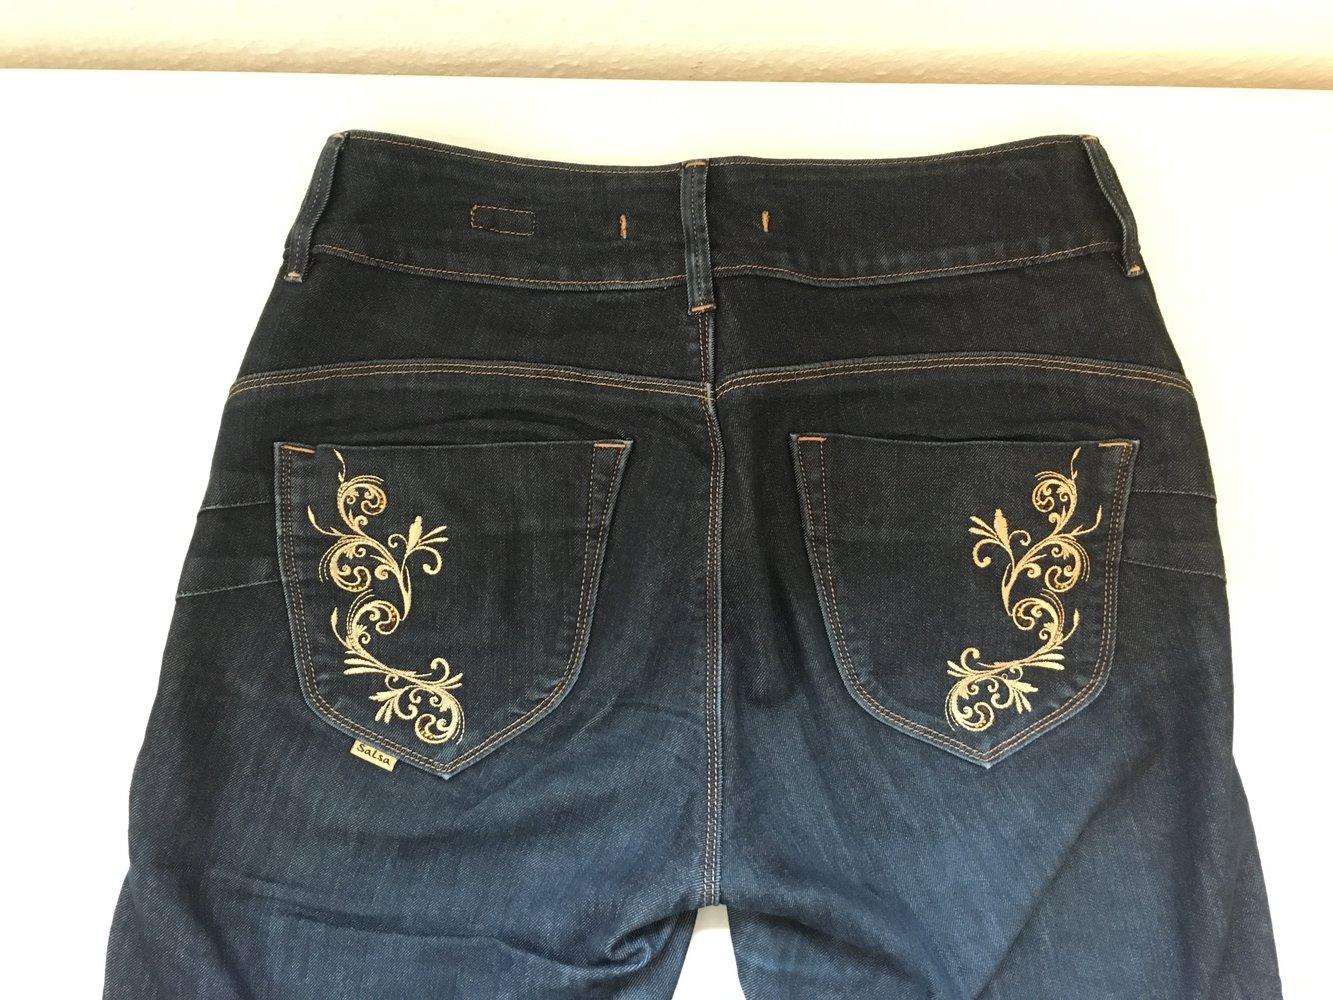 salsa jeans jeans bootcut w30 l34 dark denim hoher bund high rise. Black Bedroom Furniture Sets. Home Design Ideas